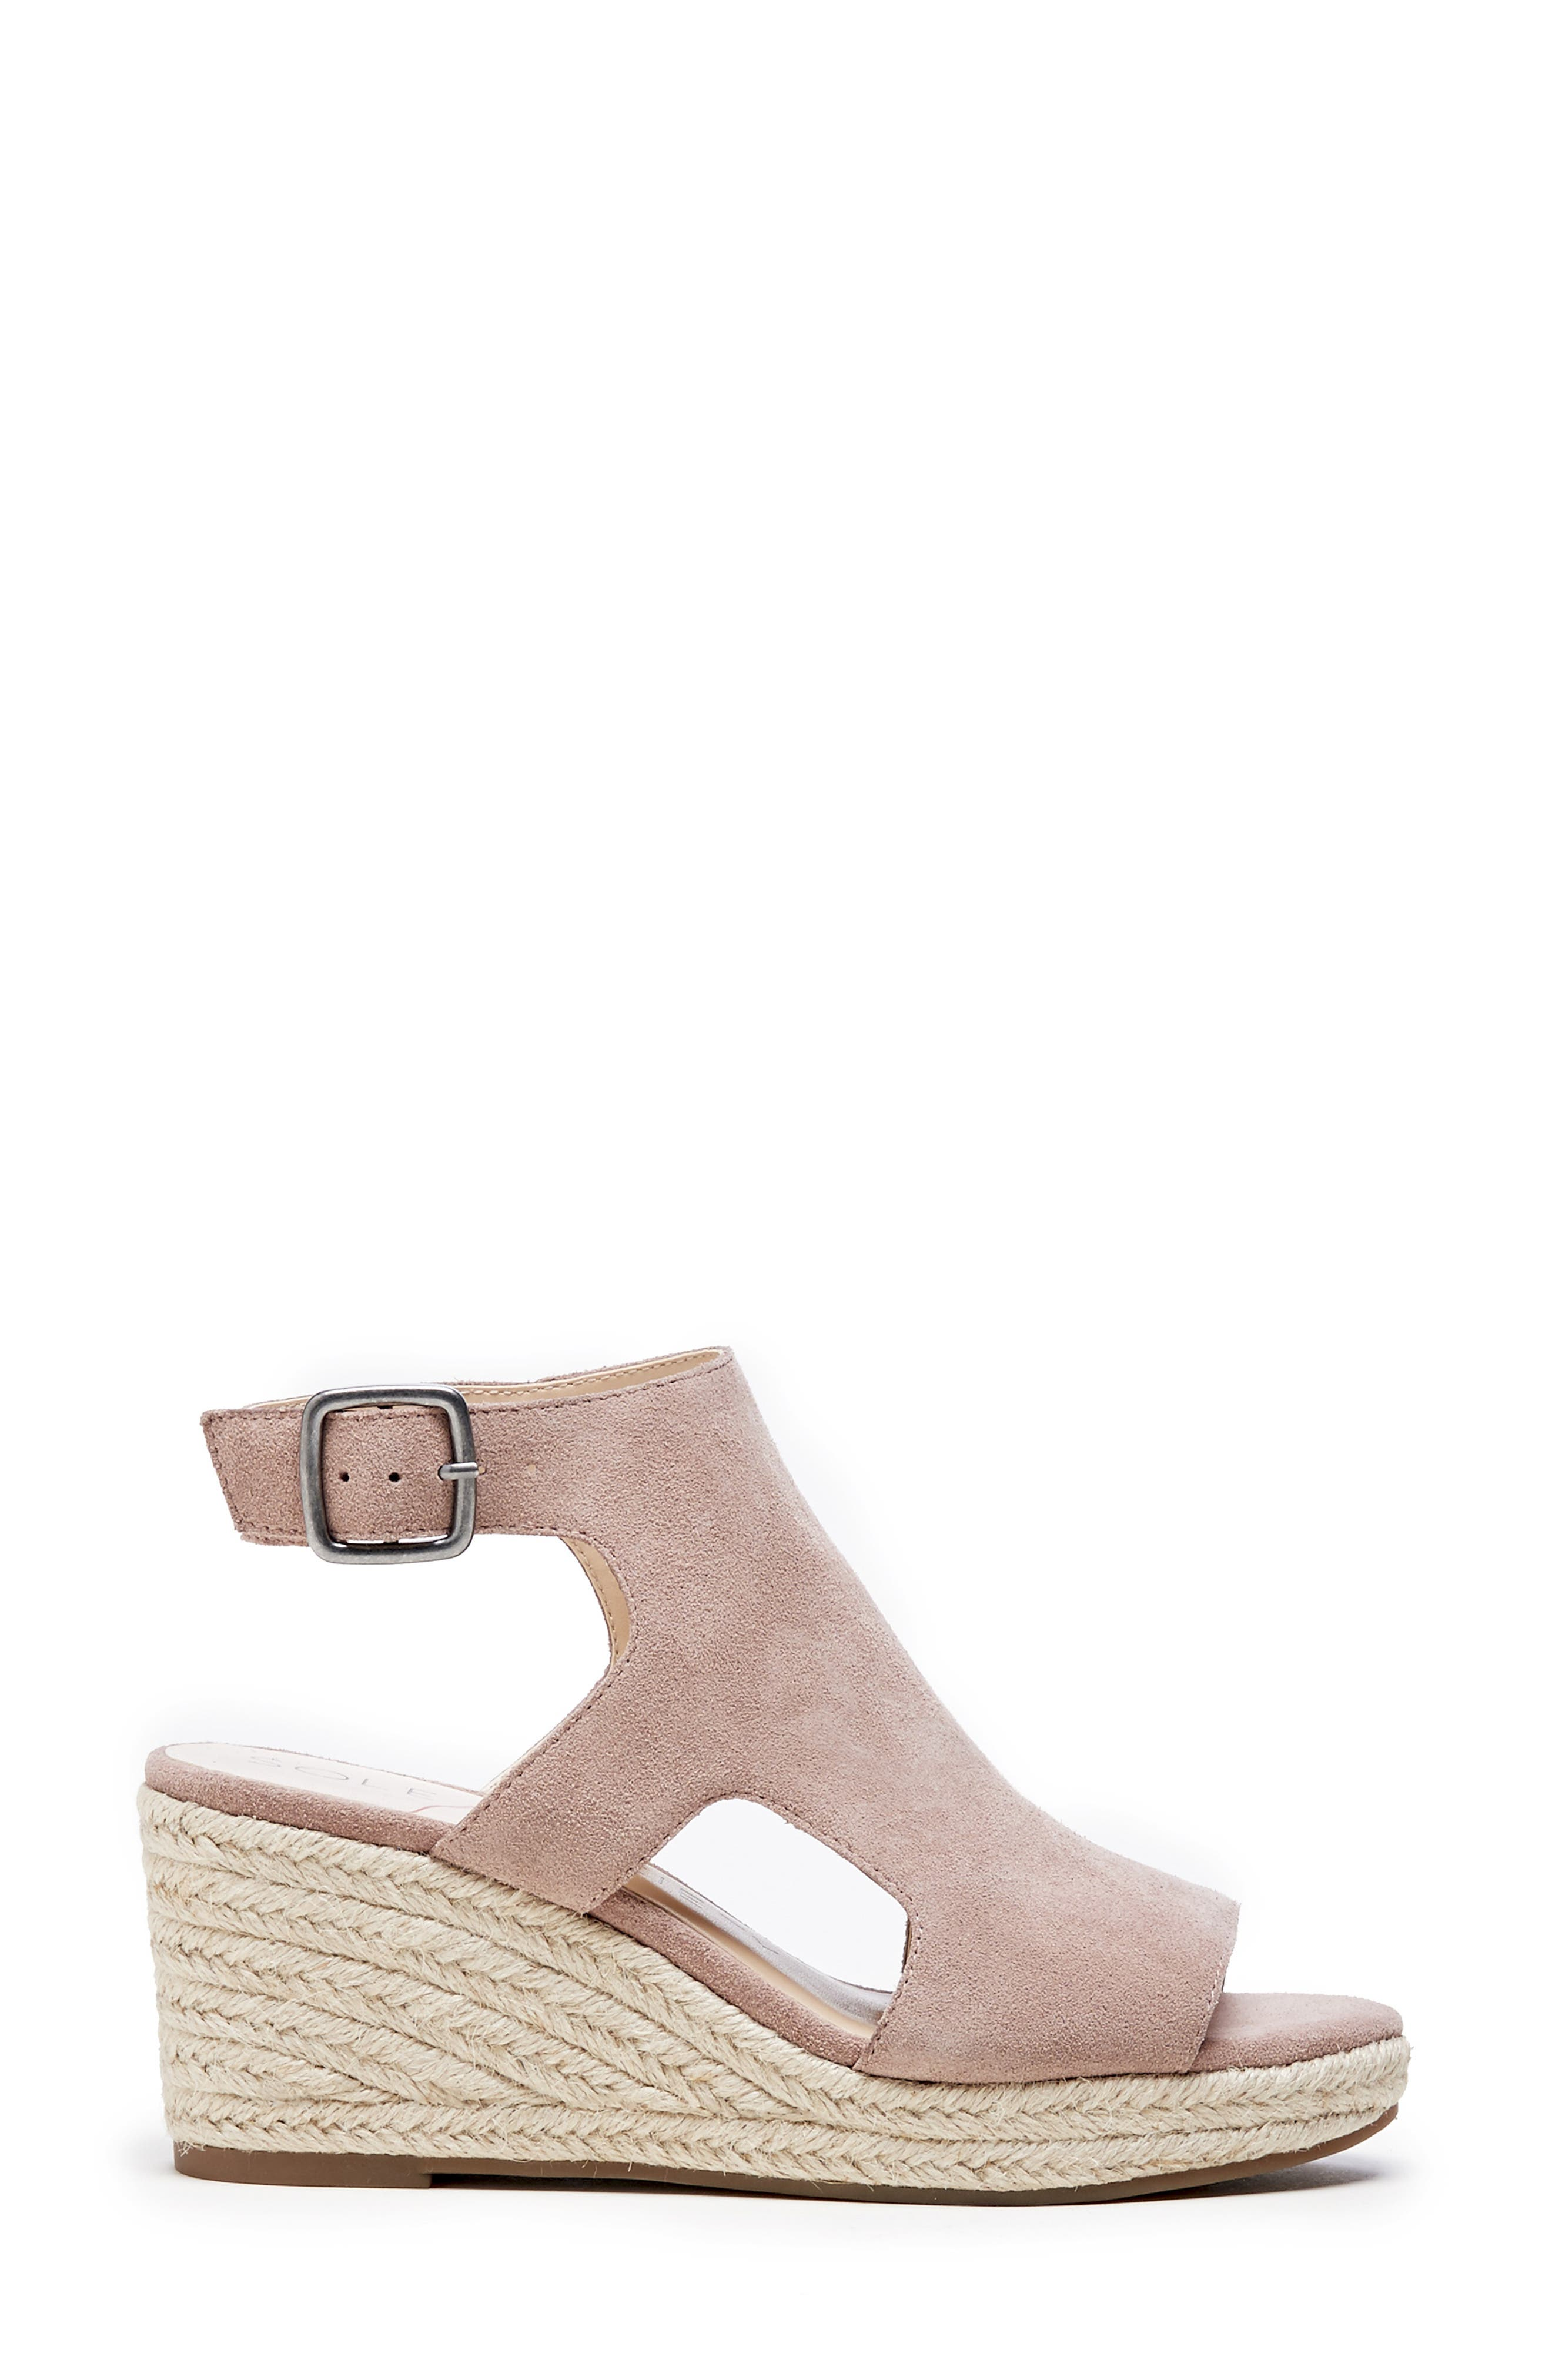 6b34224c446 Women s Sole Society Wedge Sandals